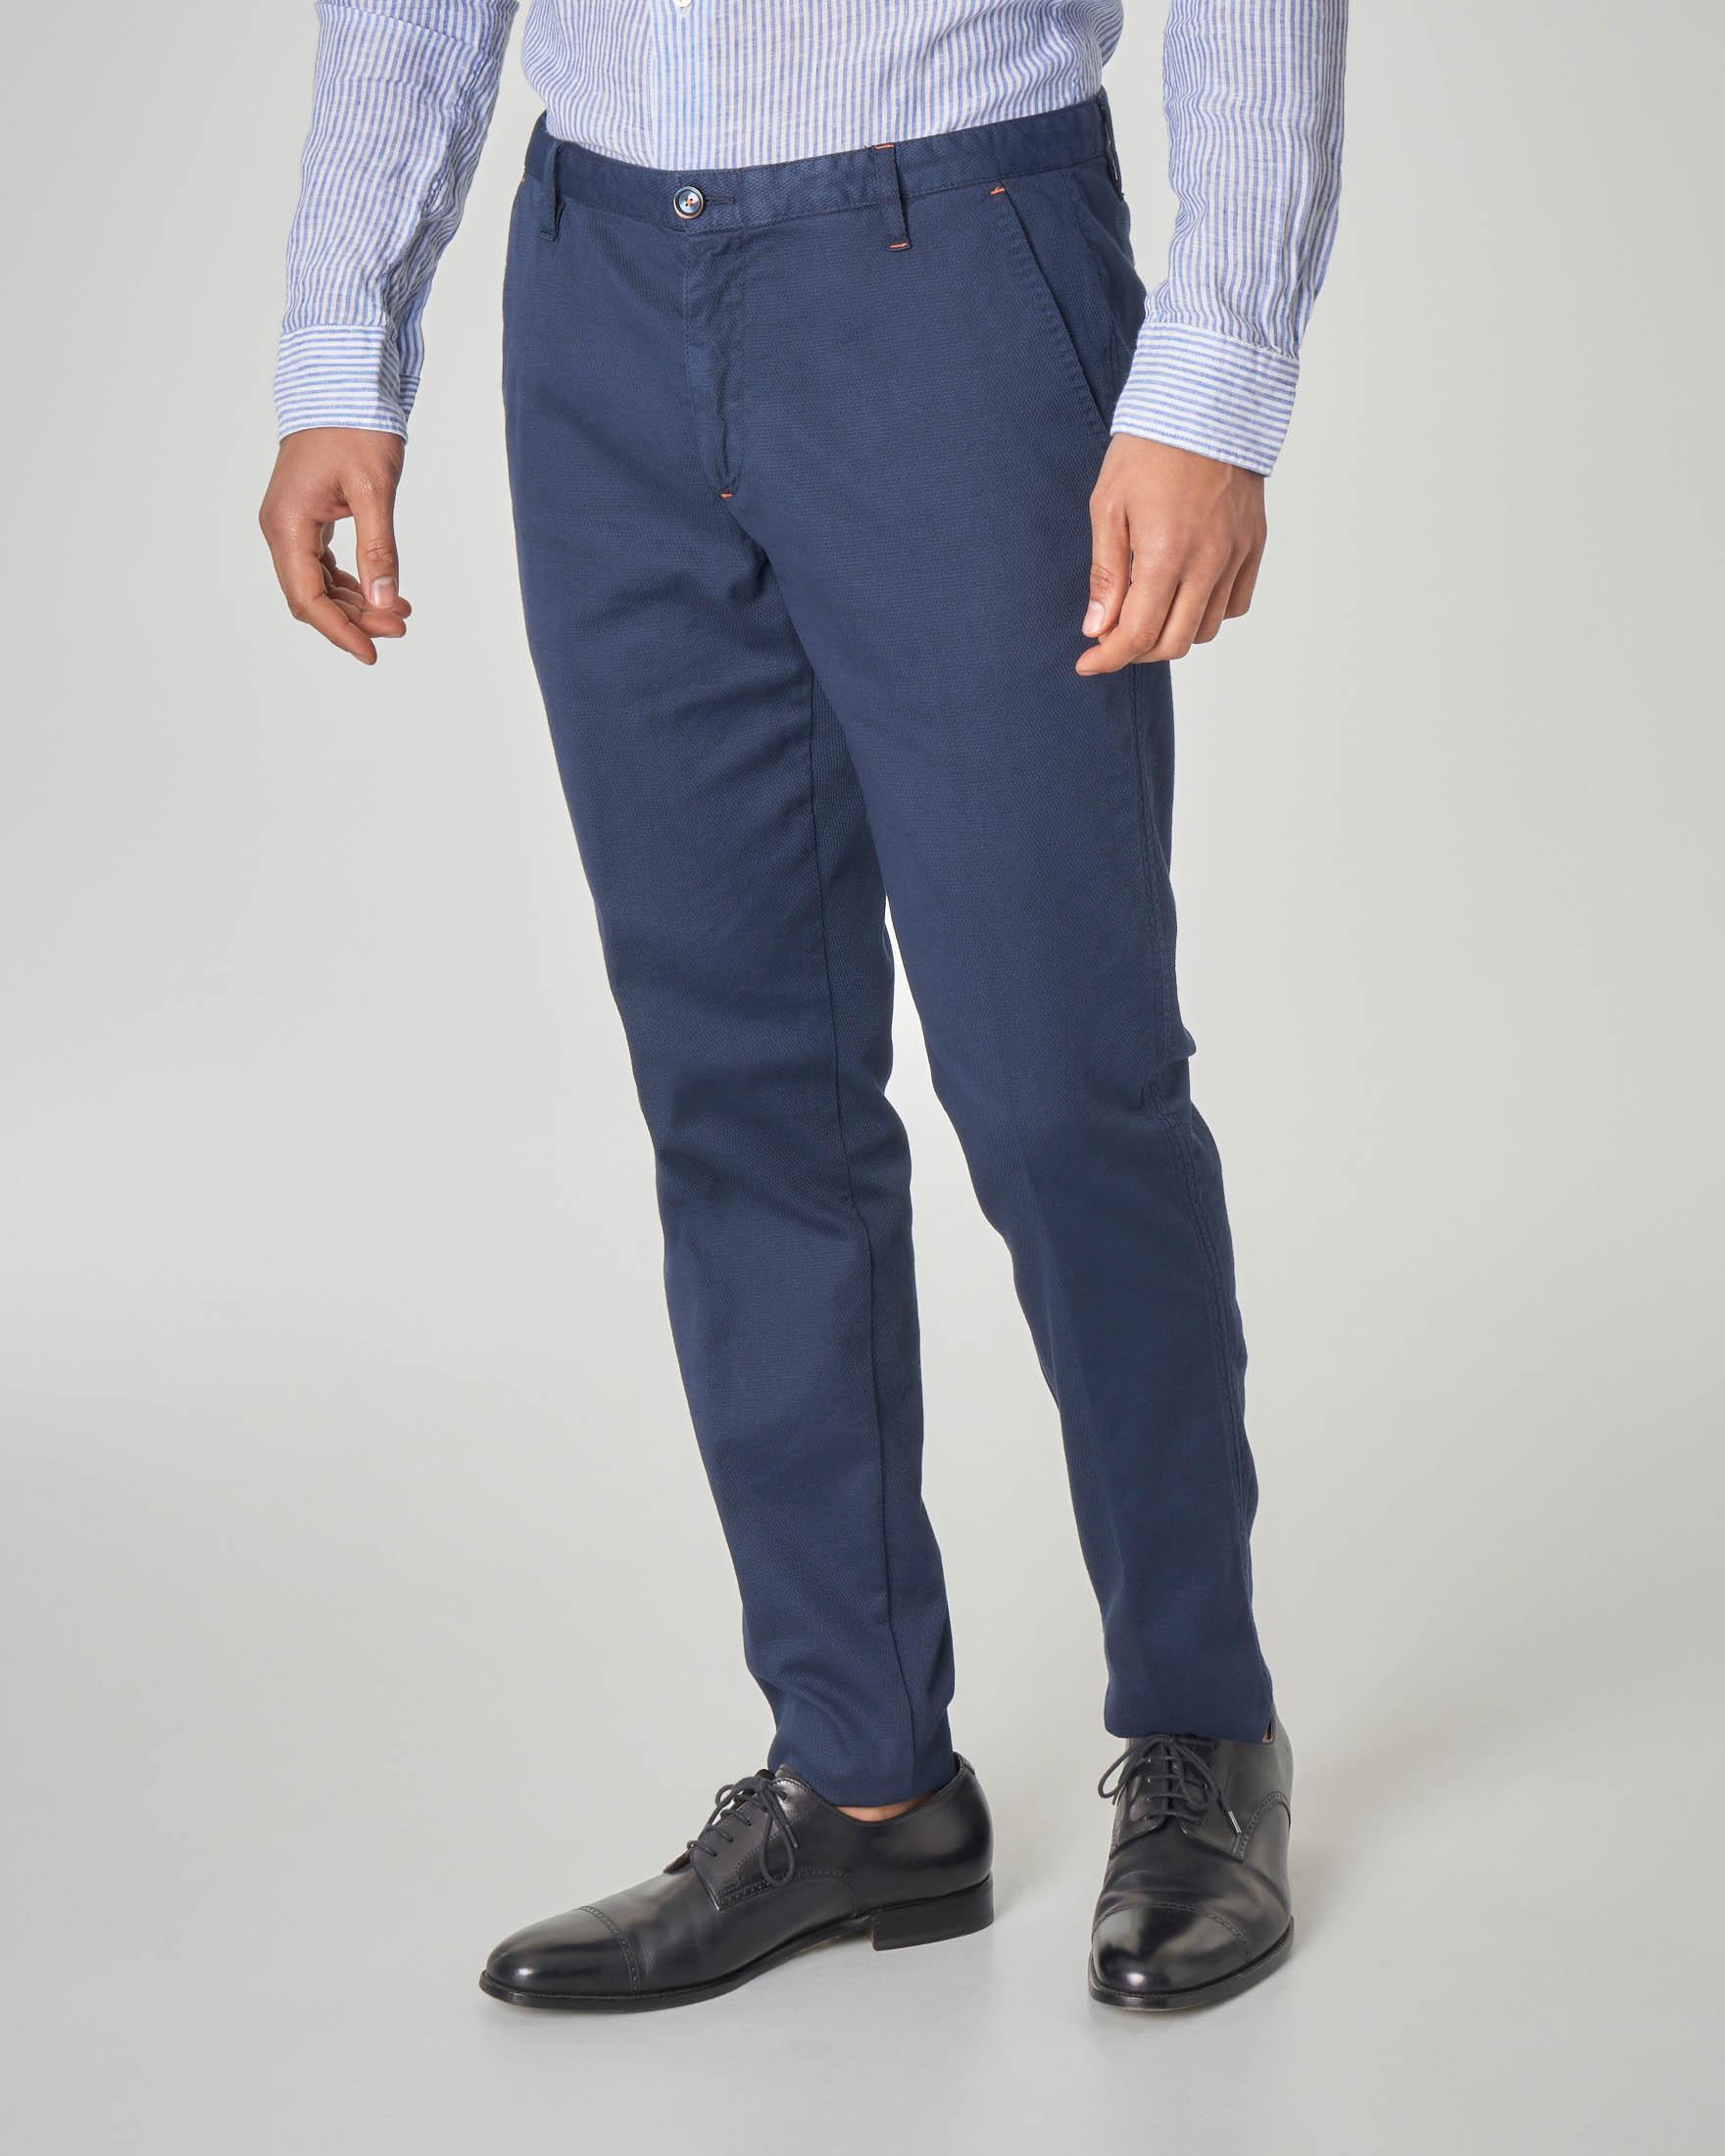 Pantalone chino blu micro-rombetto